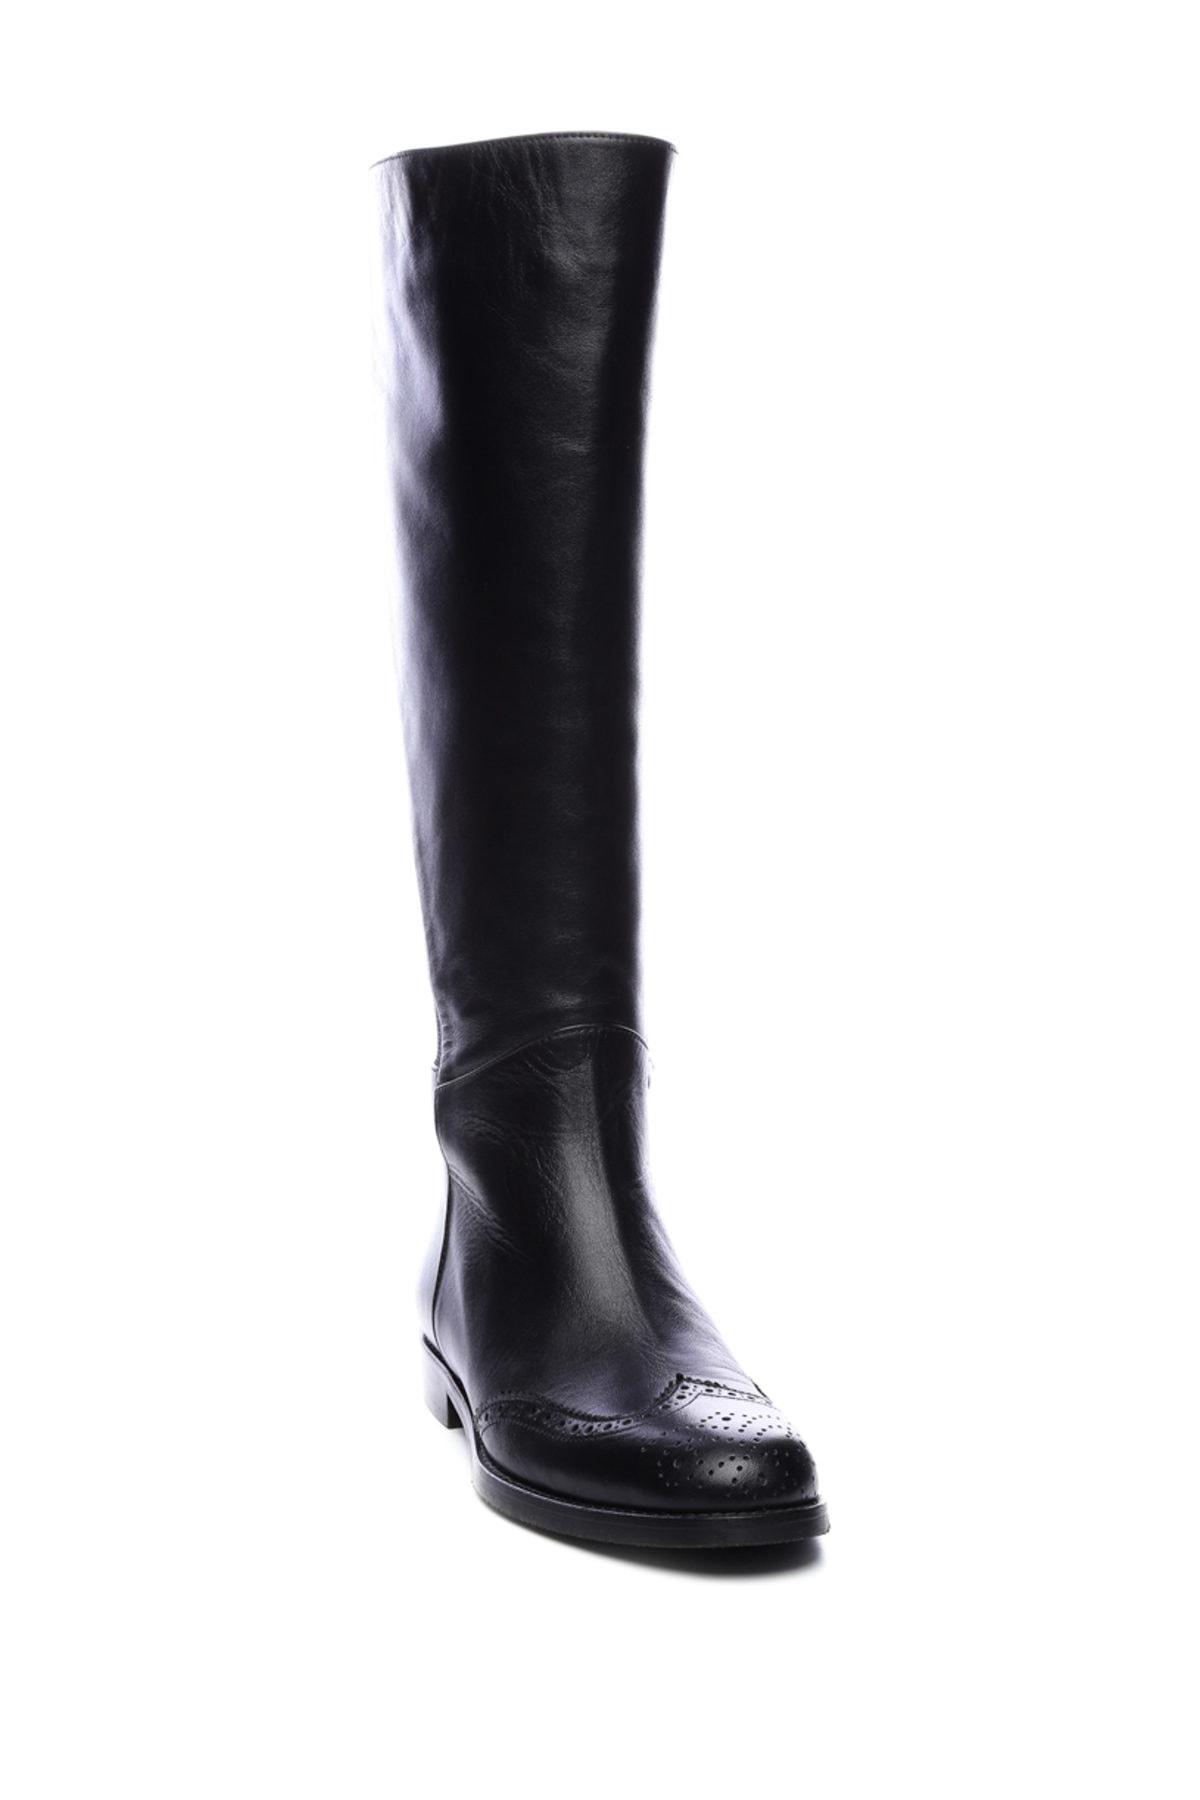 KEMAL TANCA Hakiki Deri Siyah Kadın Casual Çizme 51 1085 C BN CIZME 2